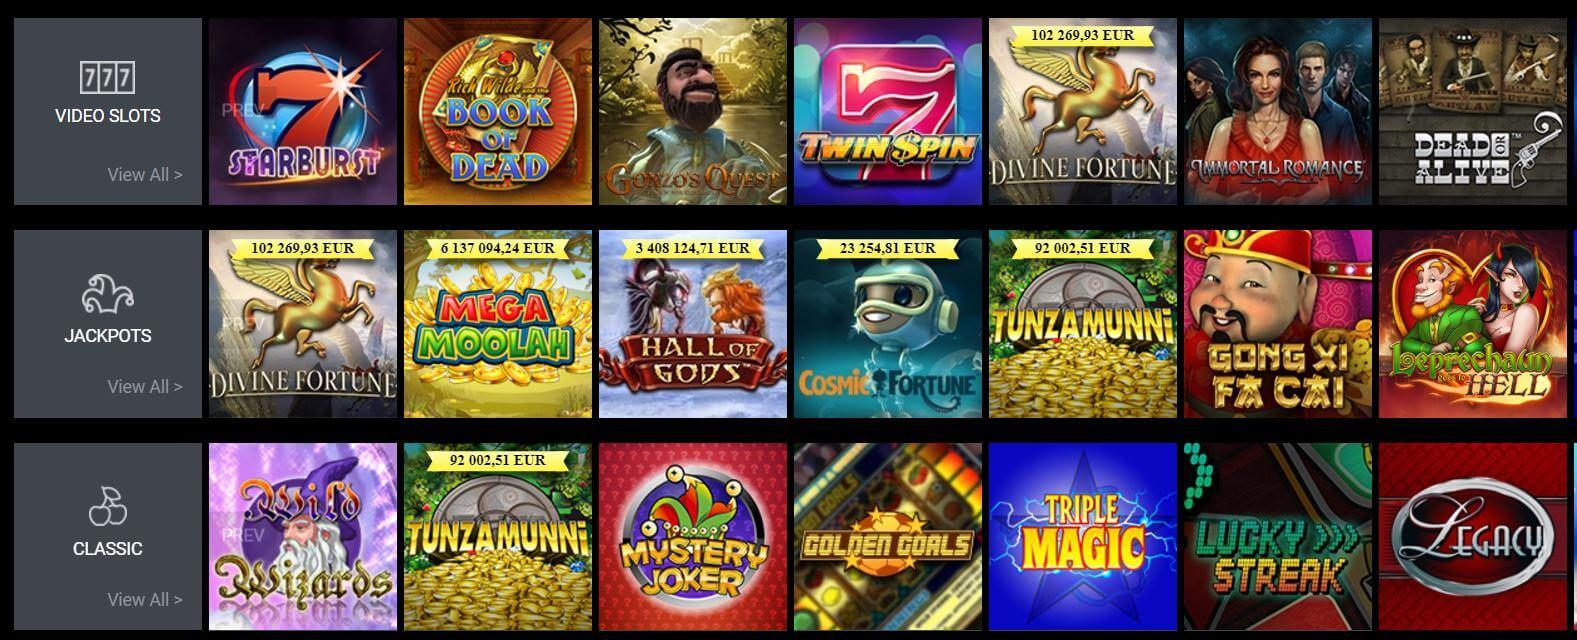 Viks Casino Games